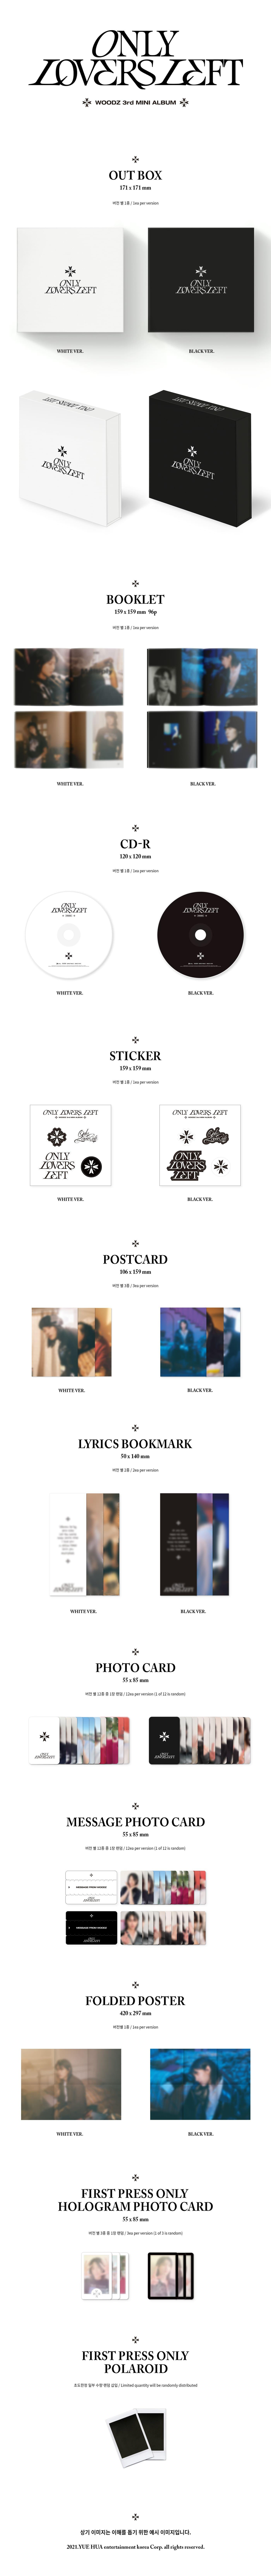 WOODZ - ONLY LOVERS LEFT - 3rd Mini Album